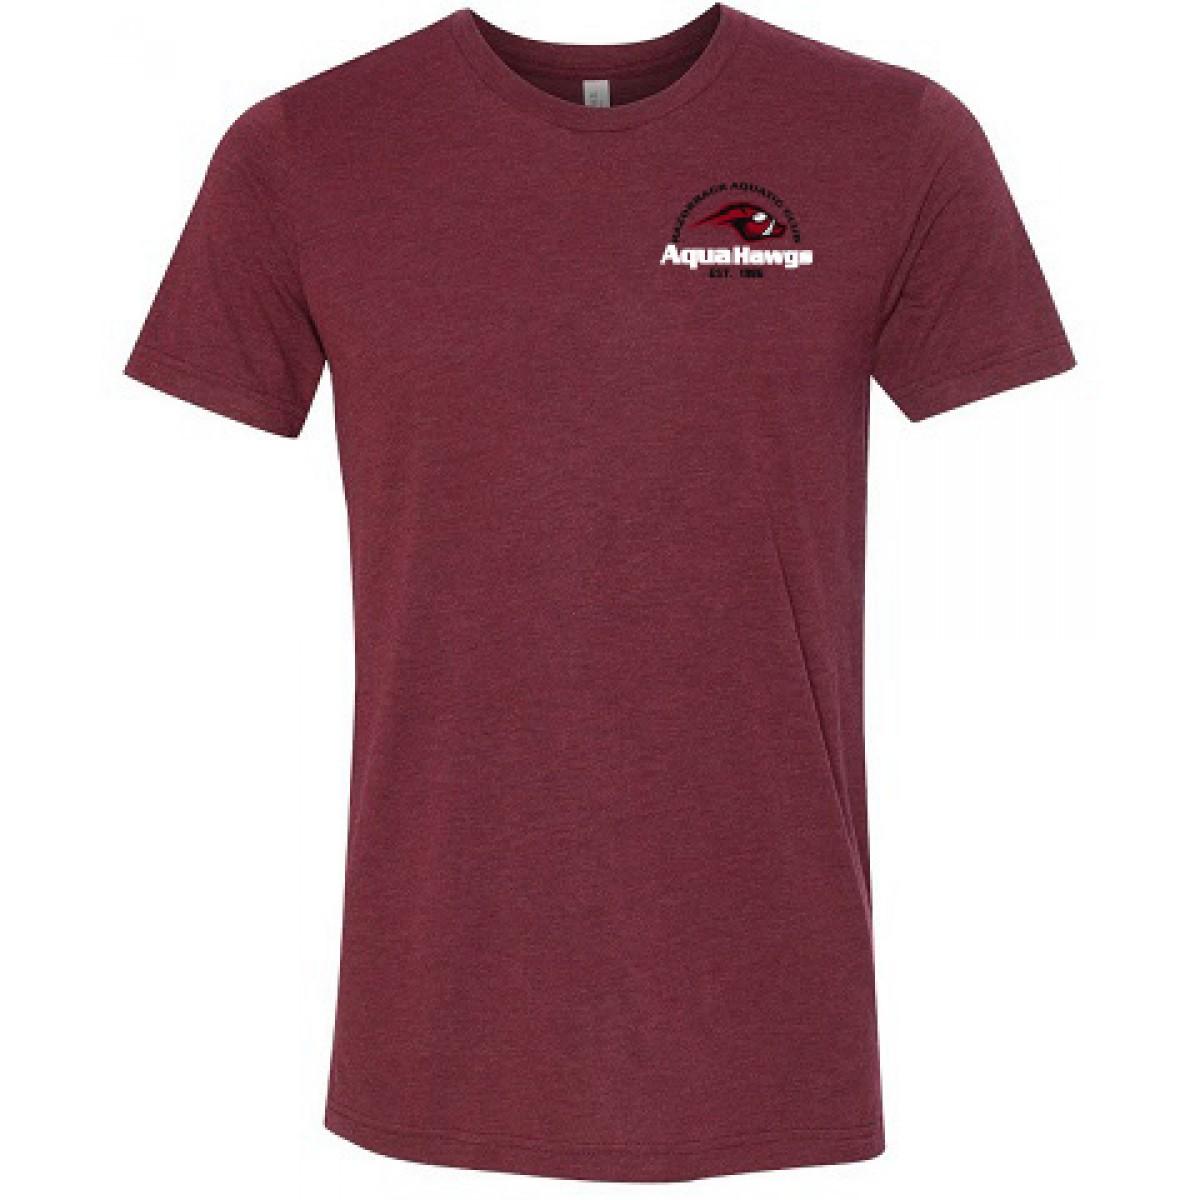 Bella+Canvas Unisex Short Sleeve Jersey T-Shirt-Cardinal Red-YL